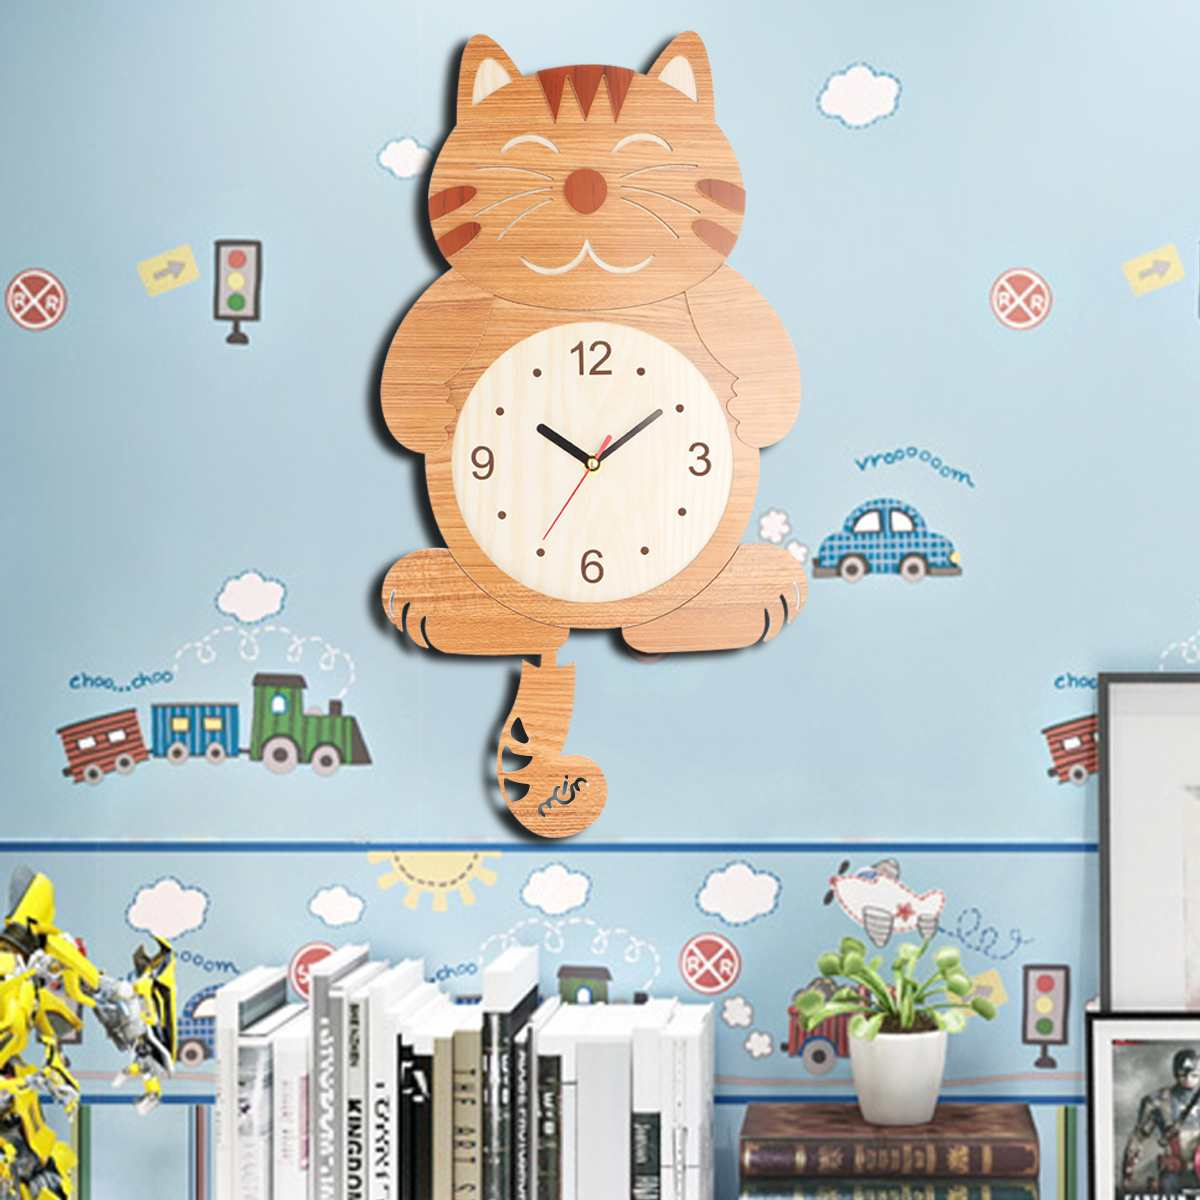 Wall Clock Wooden Cat Pattern Swinging Tail Pendulum Cartoon Clocks Battery Operated Room Home Decor Wood Hanging Wall Clocks